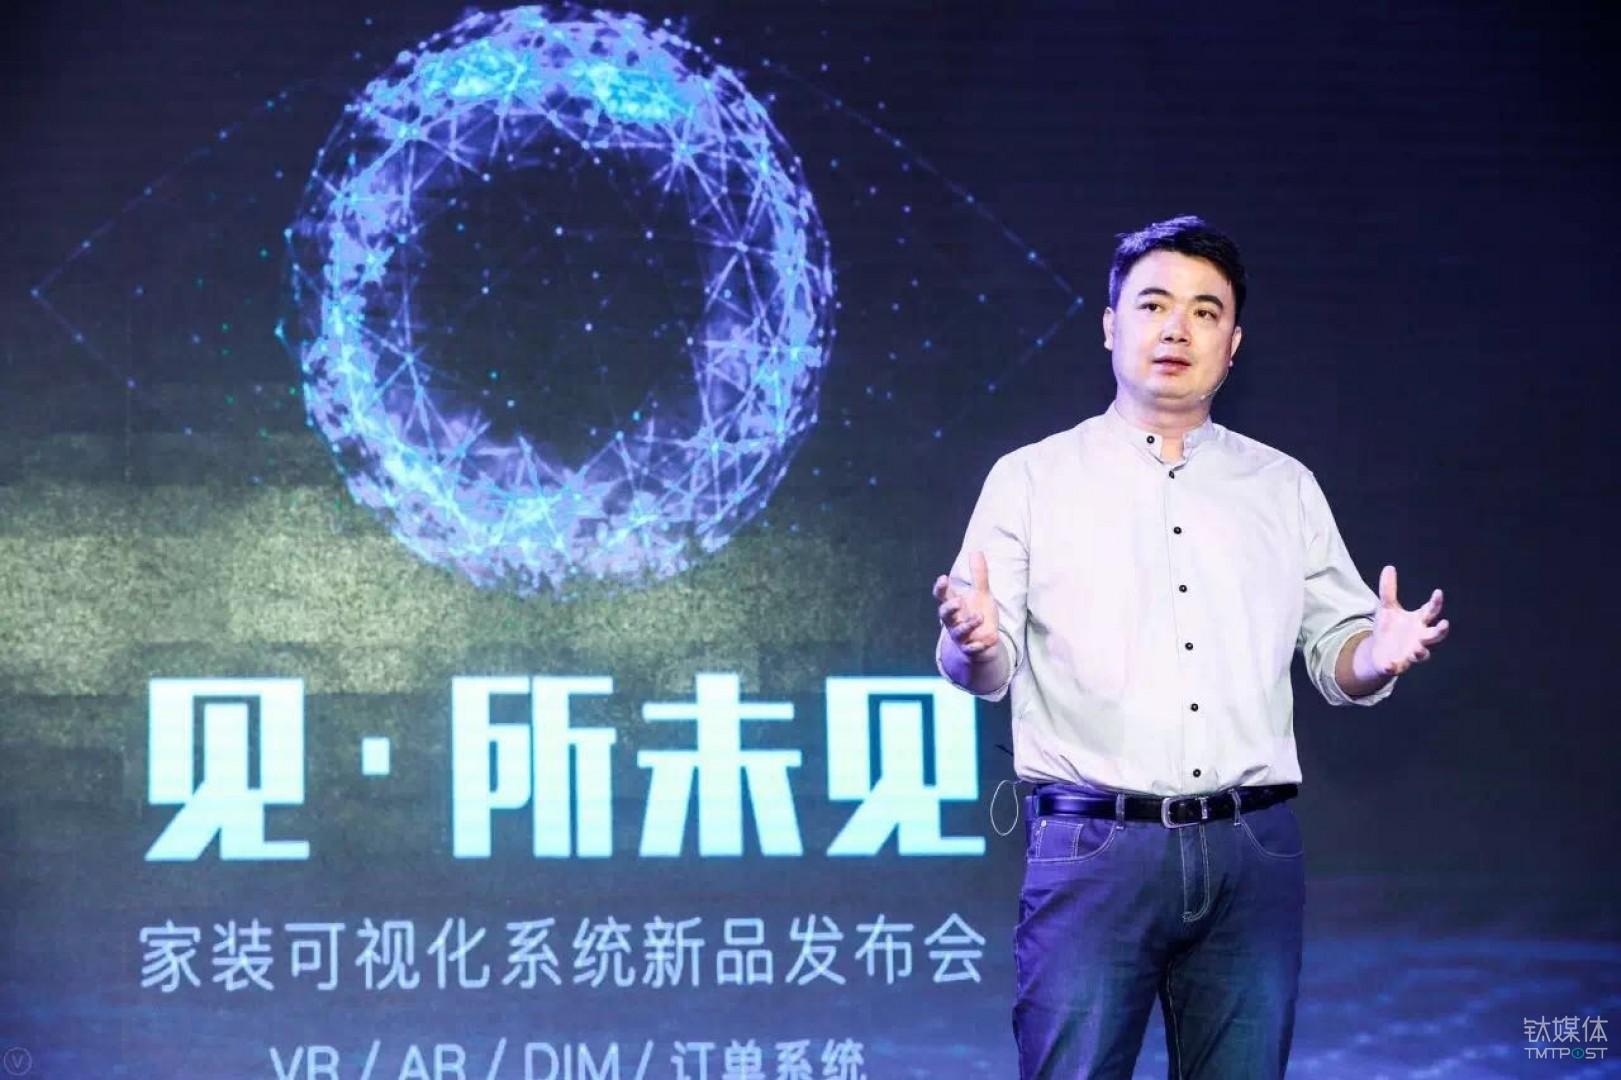 VR 打扮家创始人兼 CEO 崔健